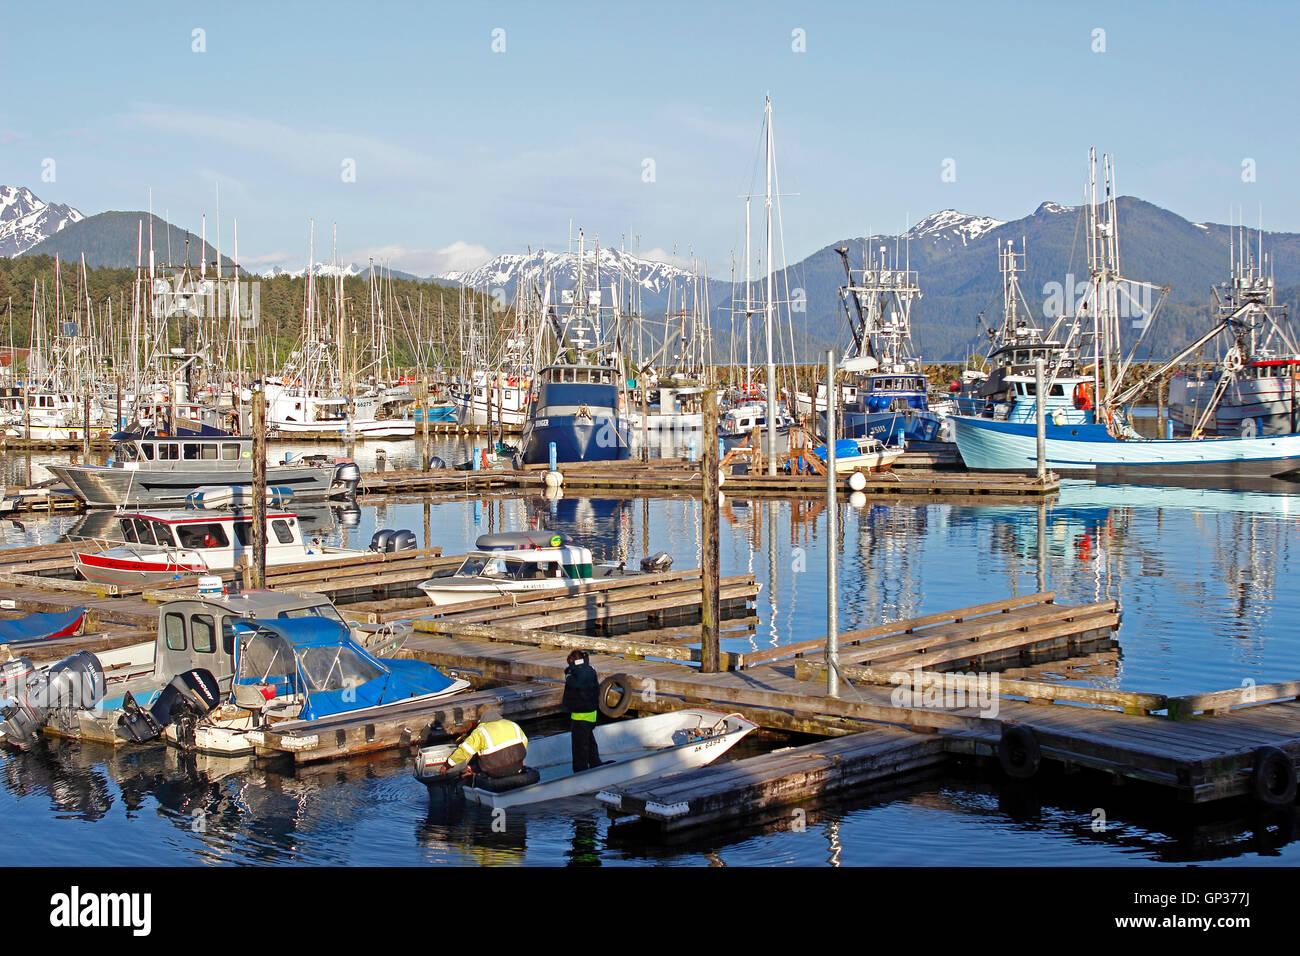 Fishing fleet Crescent Harbor marina mountains Sitka Alaska